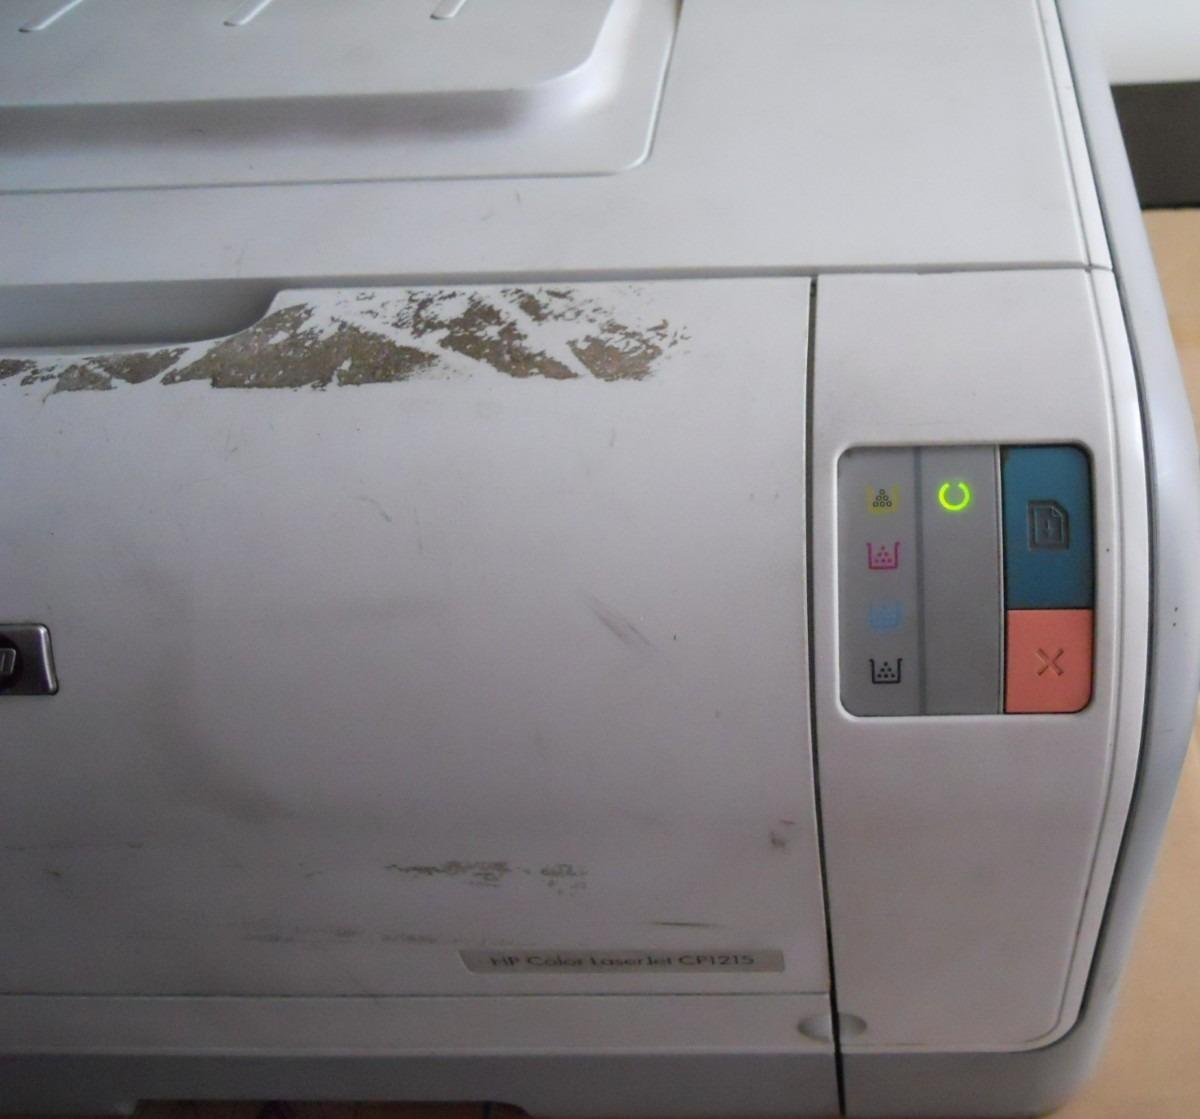 Toner Para Impresora Hp 1215 Laser Color O 1212 395 00